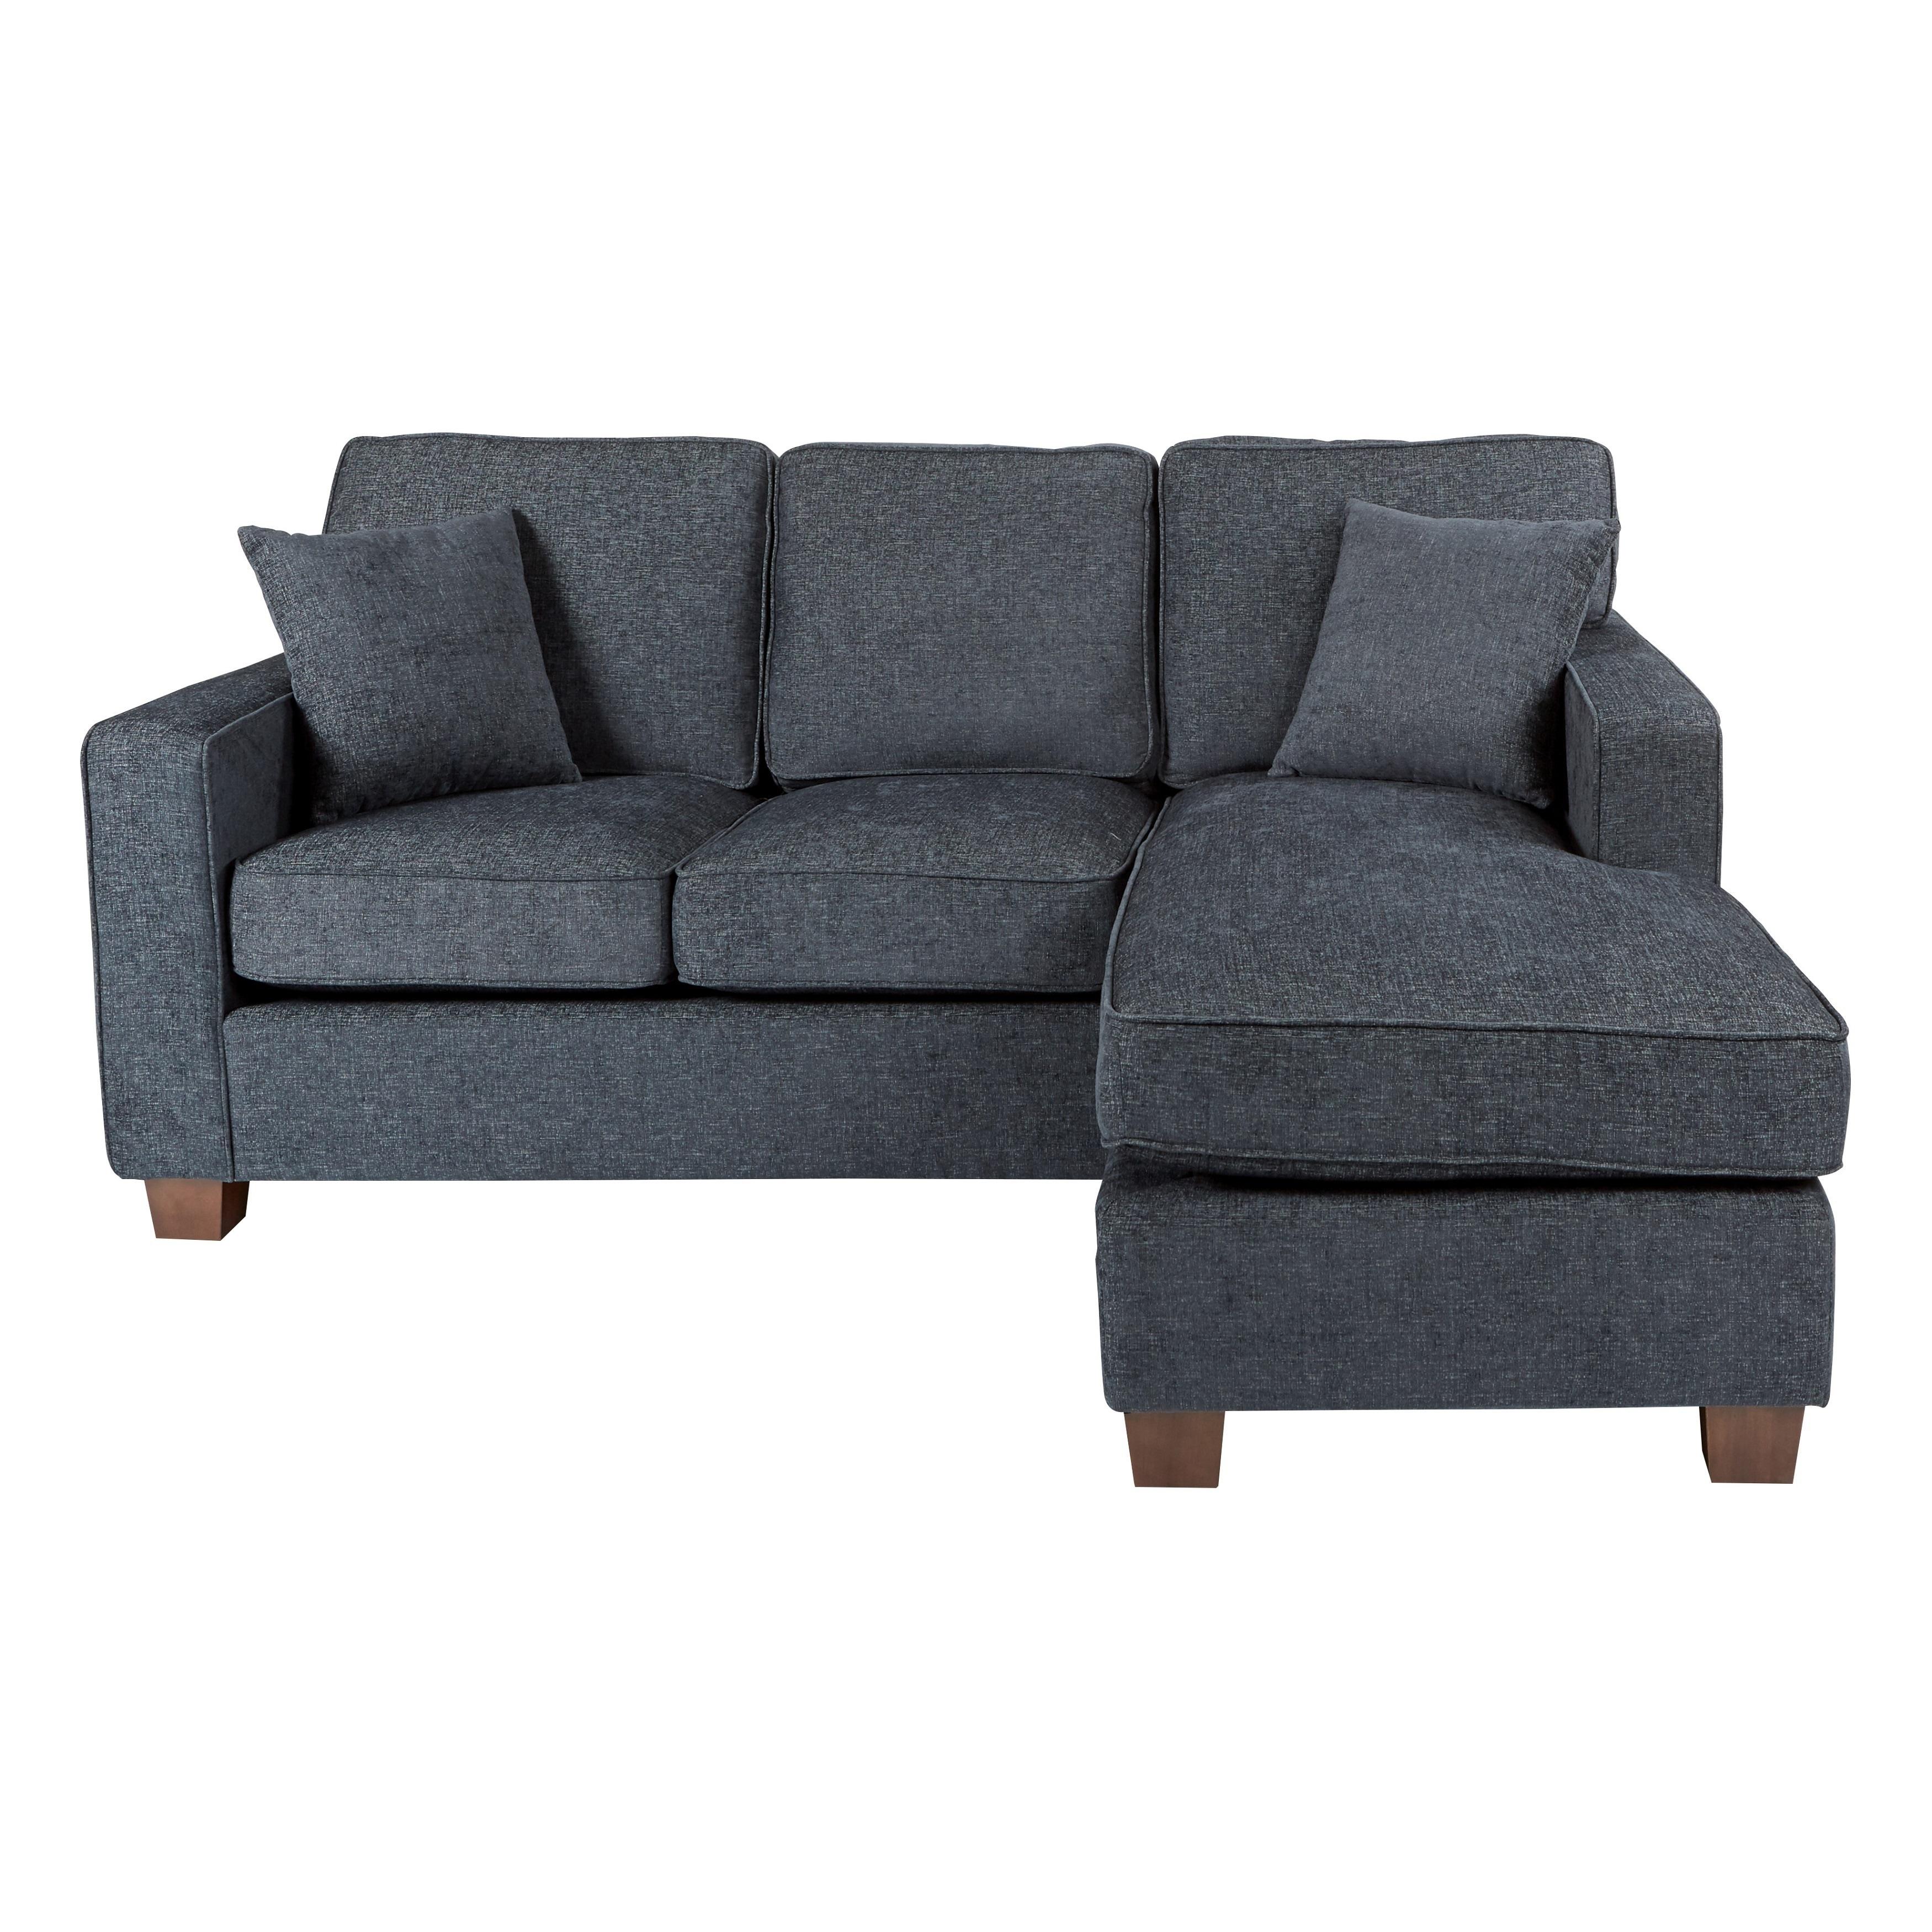 Reversible Sofa 3 Piece Sectional Sofa Set Gray Charcoal